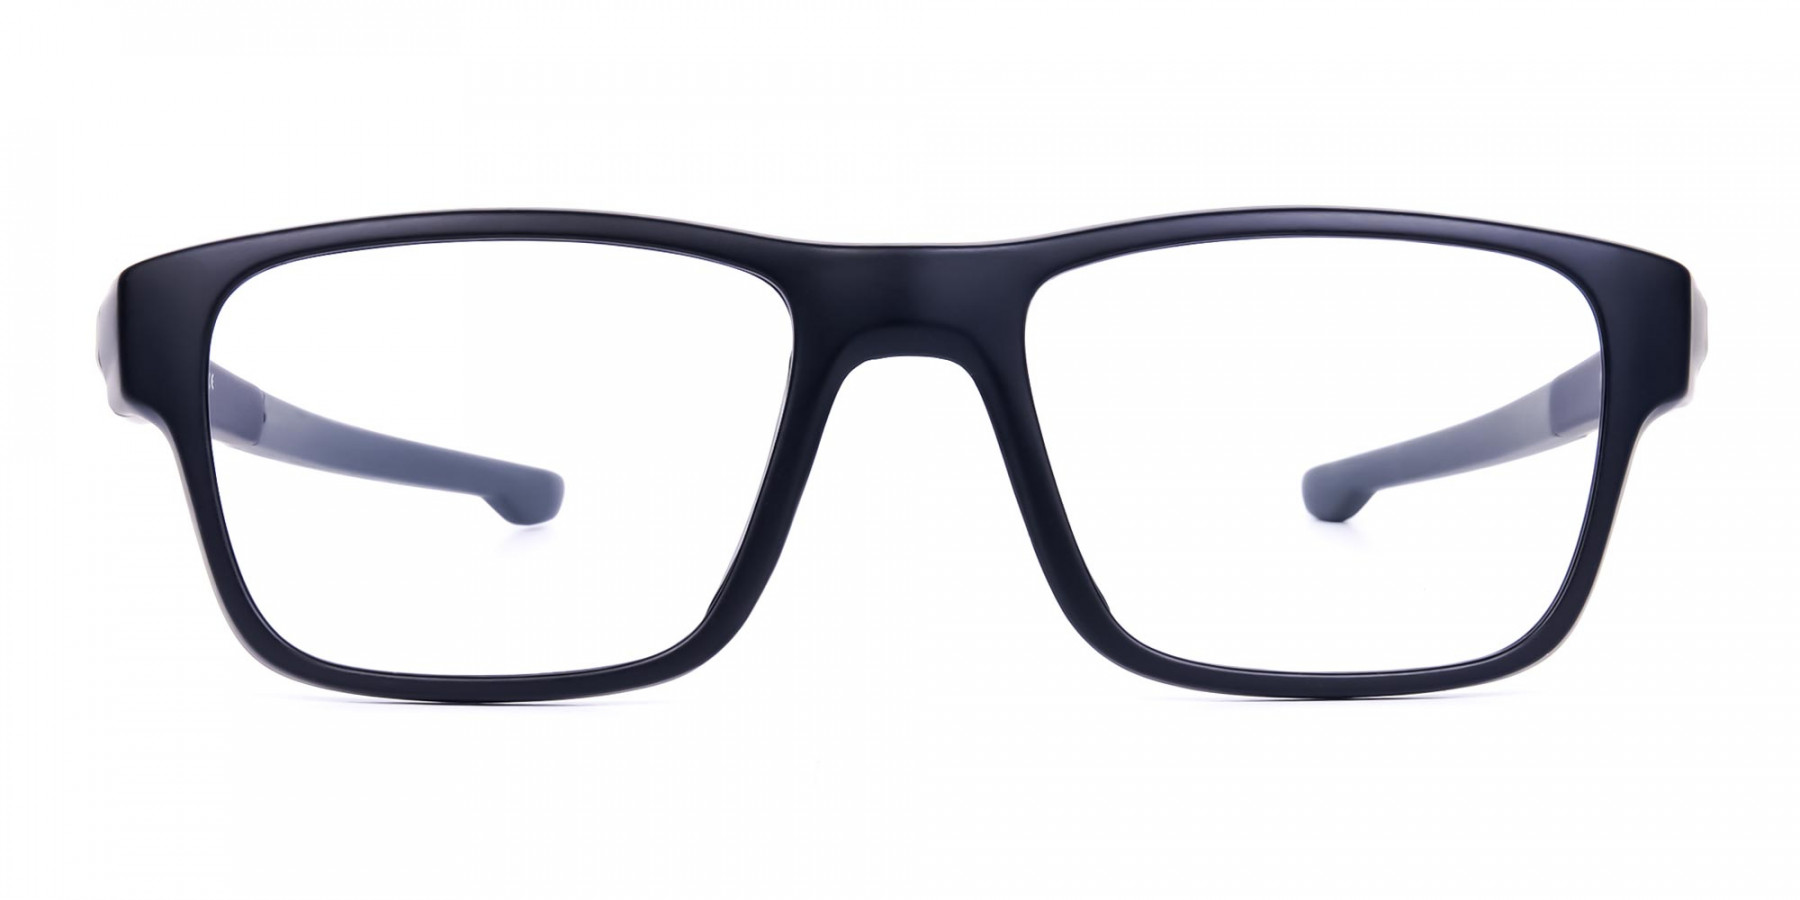 Rectangular Matte Black and Grey sports goggles-1